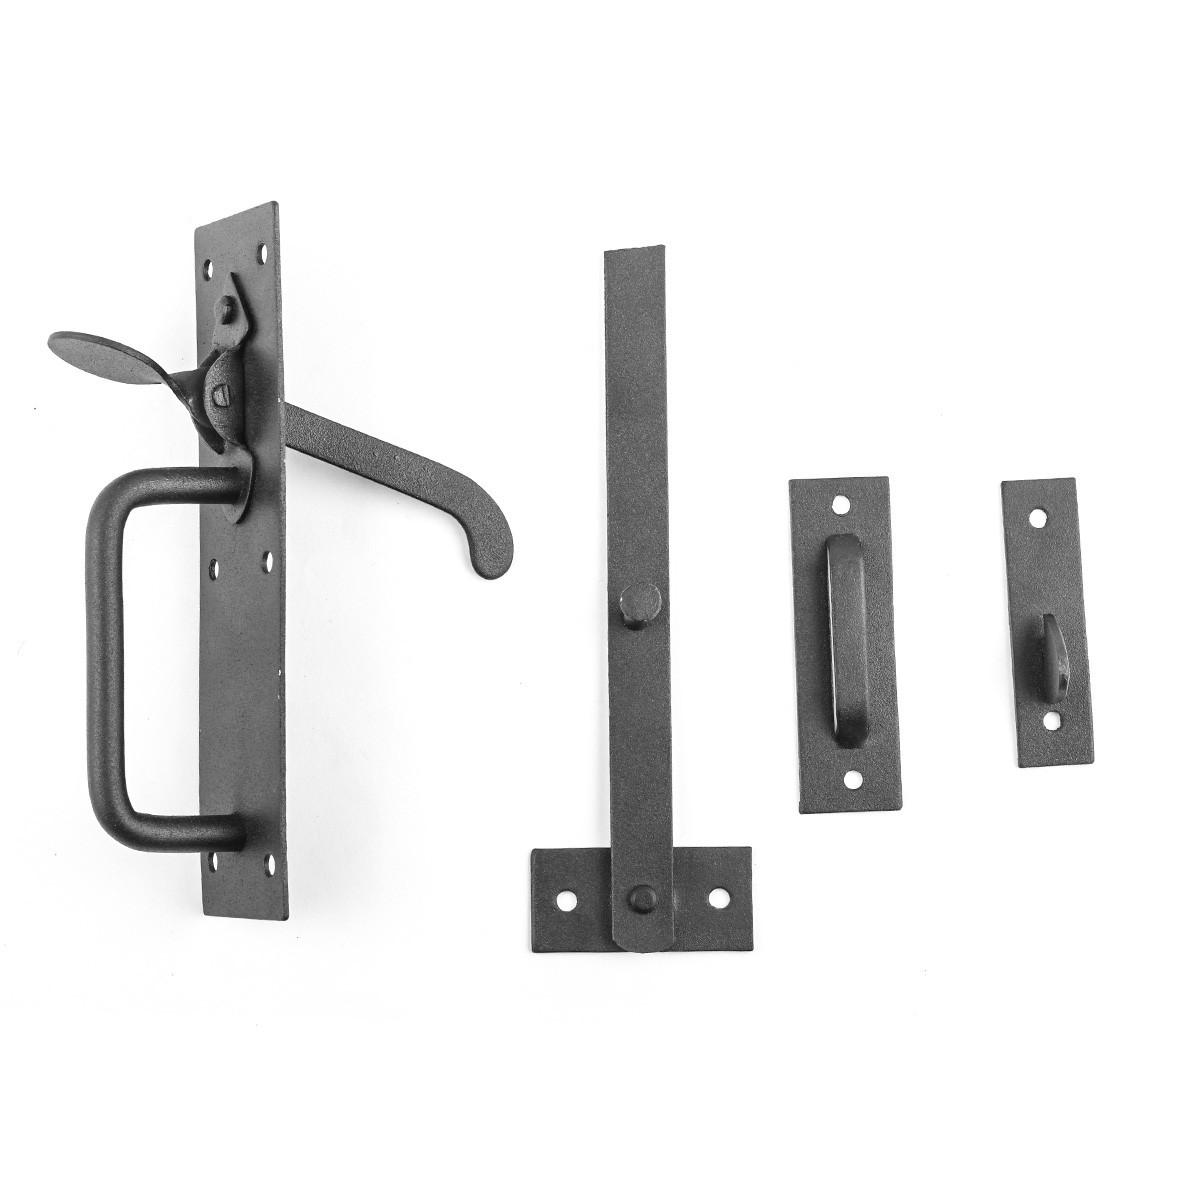 Black Iron Door Latch Lock Set Norfolk Gate or Door Gate Latch Rust Proof Wrought Iron Gate Latch Backyard Gate Latch